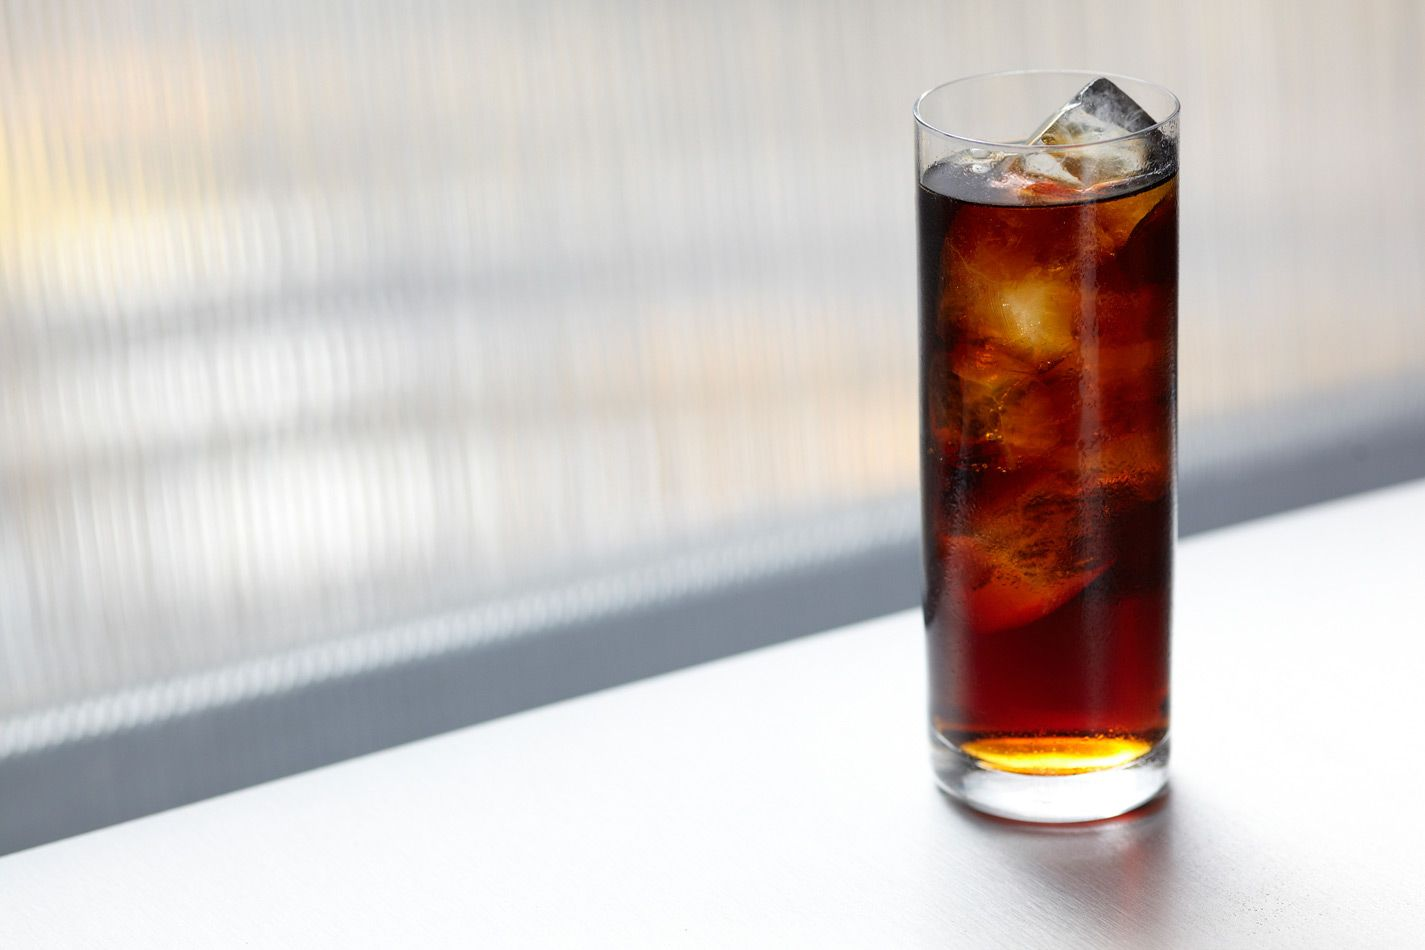 san pham - huong thuc pham - huong cola